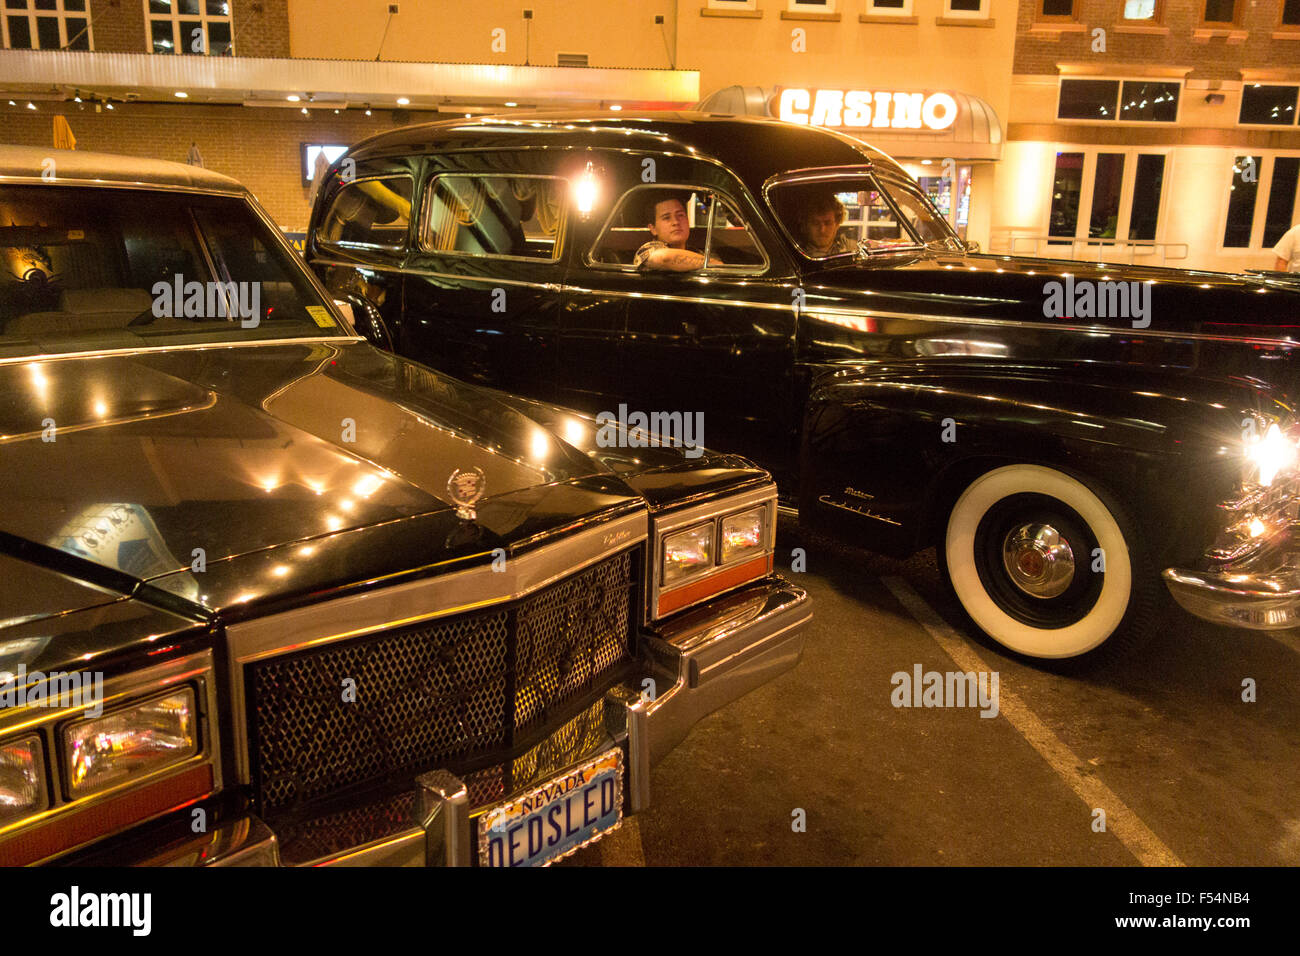 Las Vegas Cars Stock Photos & Las Vegas Cars Stock Images - Alamy